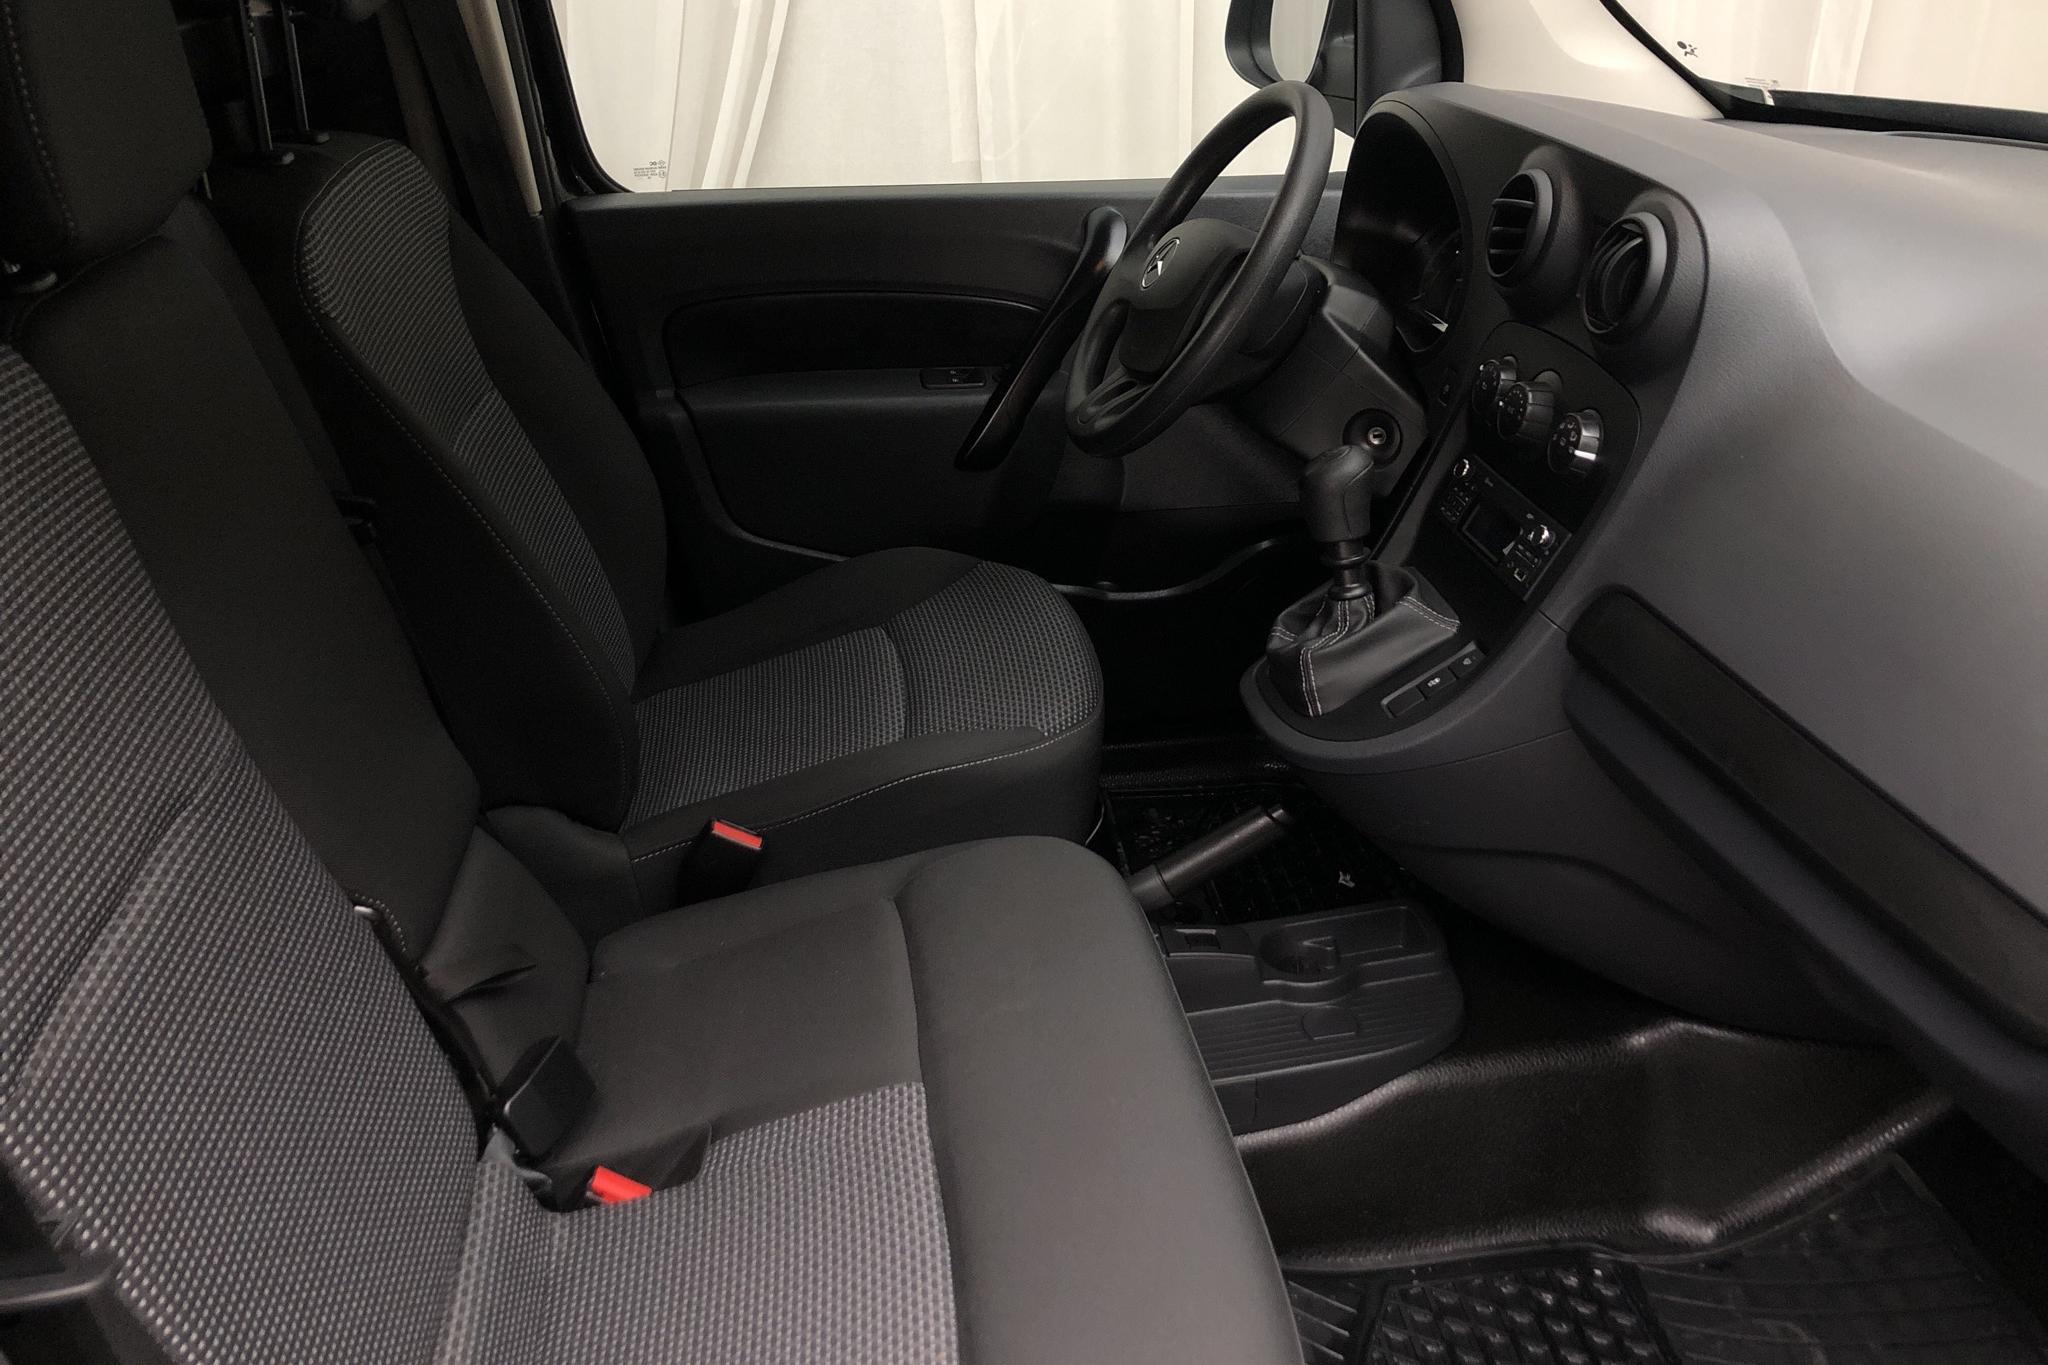 Mercedes Citan 109 1.5 CDI (95hk) - 648 mil - Manuell - svart - 2020